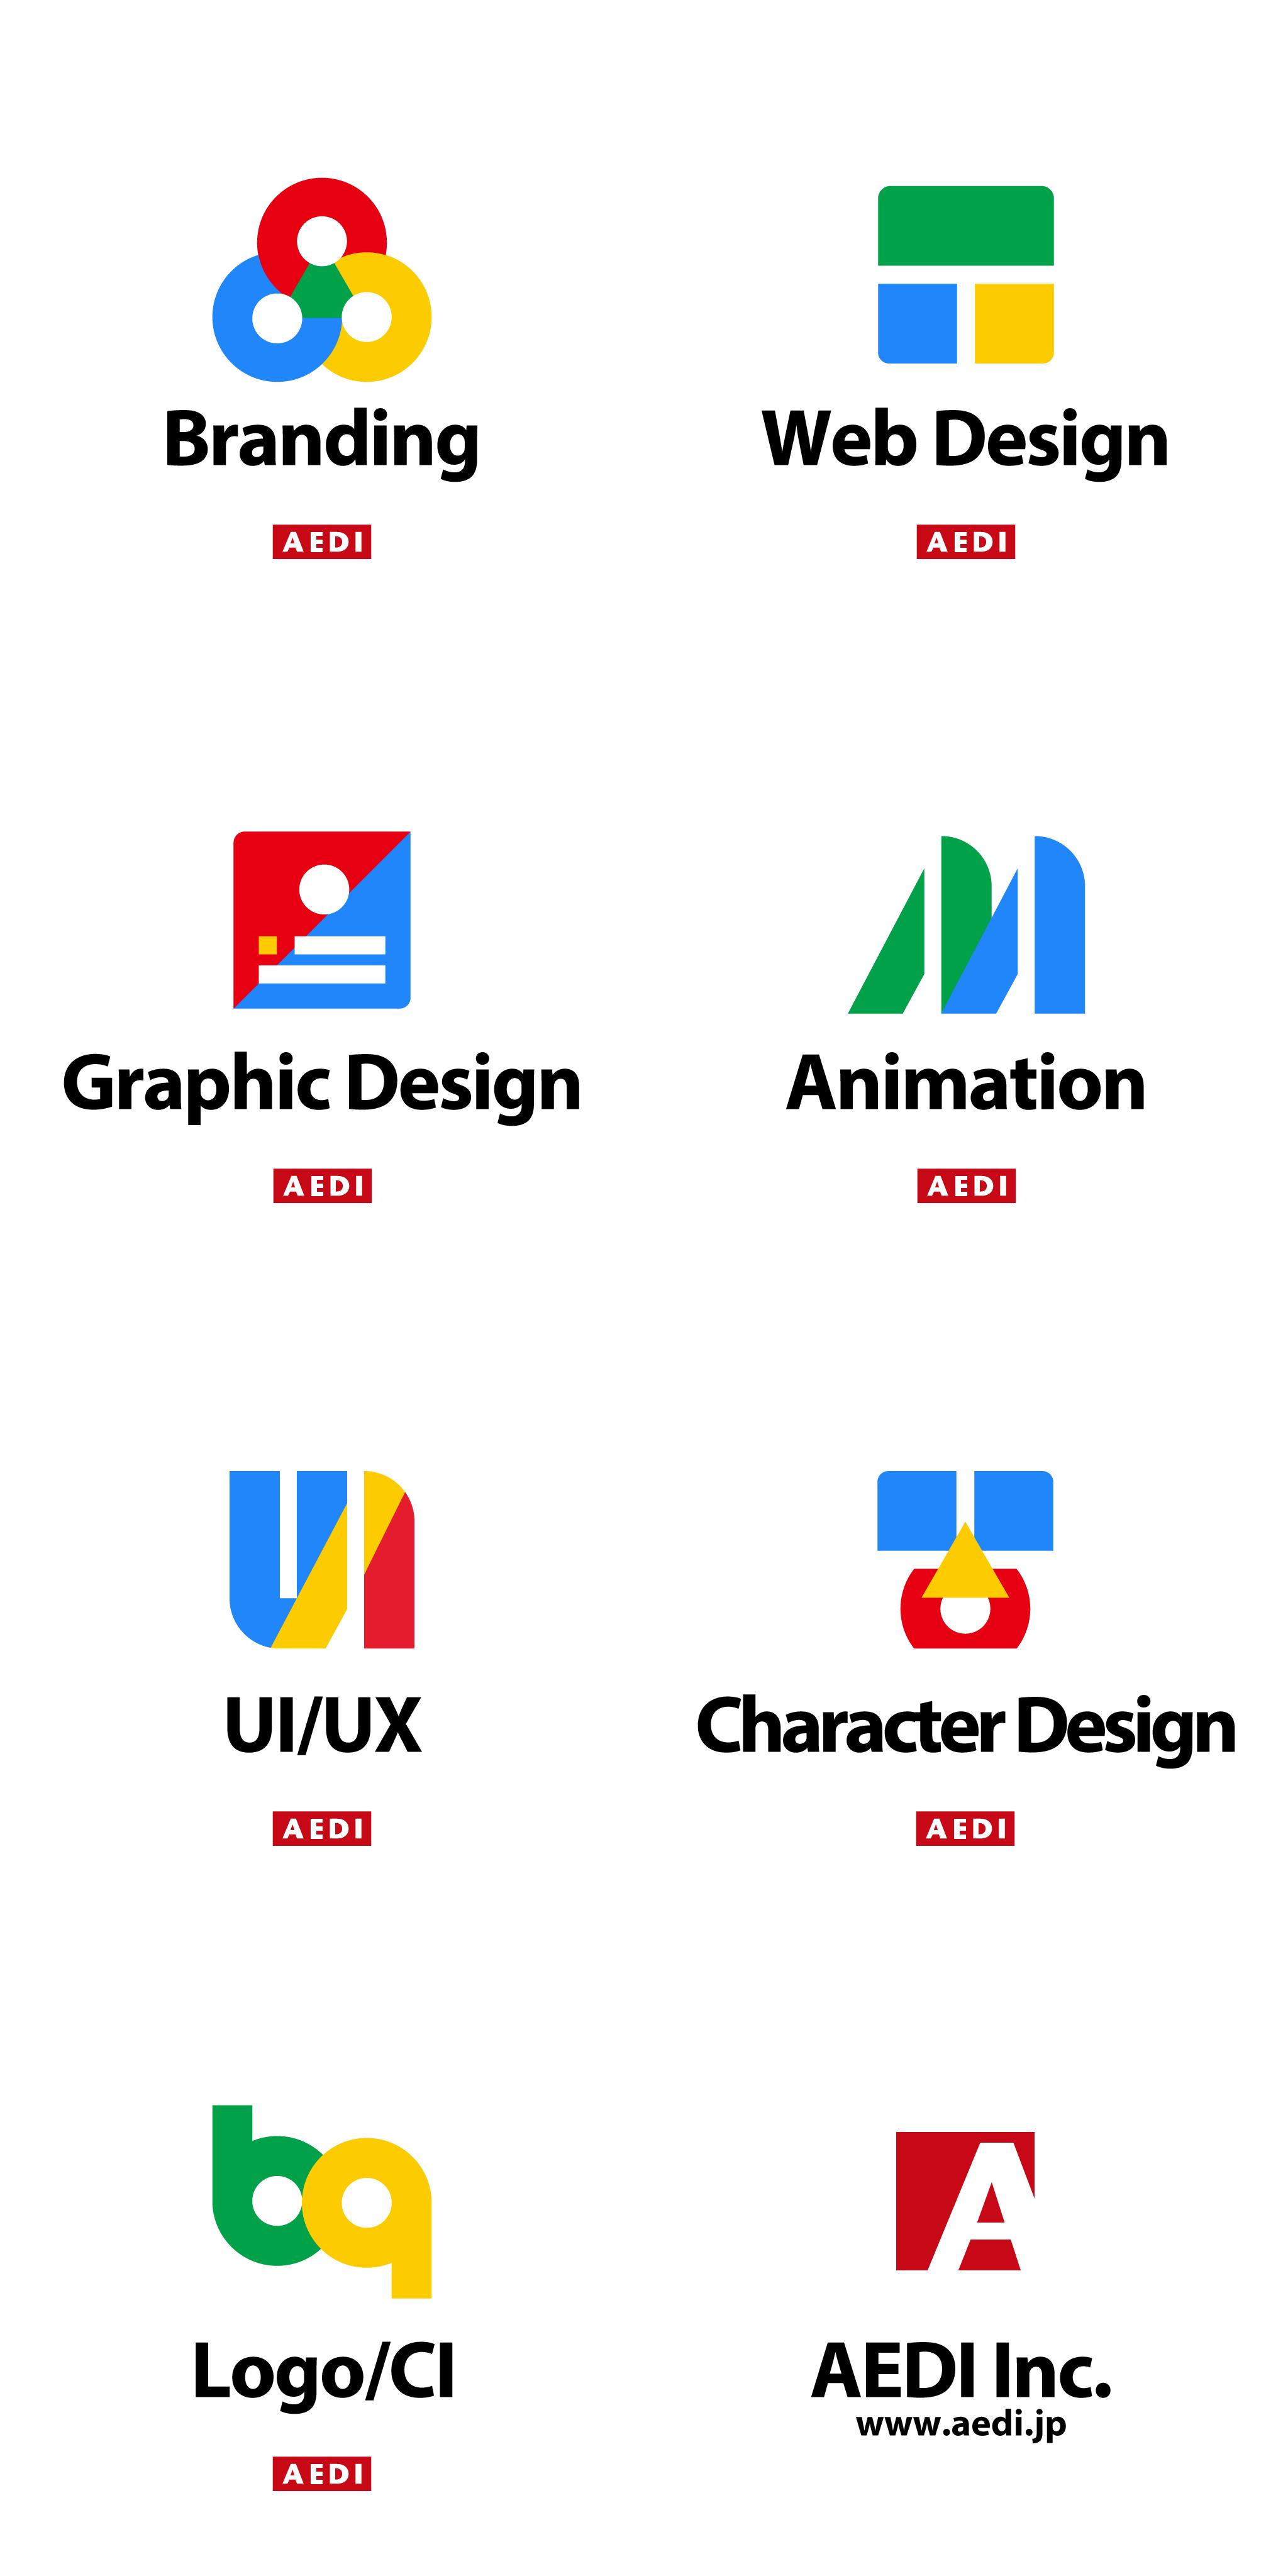 Service Icons of AEDI Inc. AEDI各サービスアイコン ブランディング